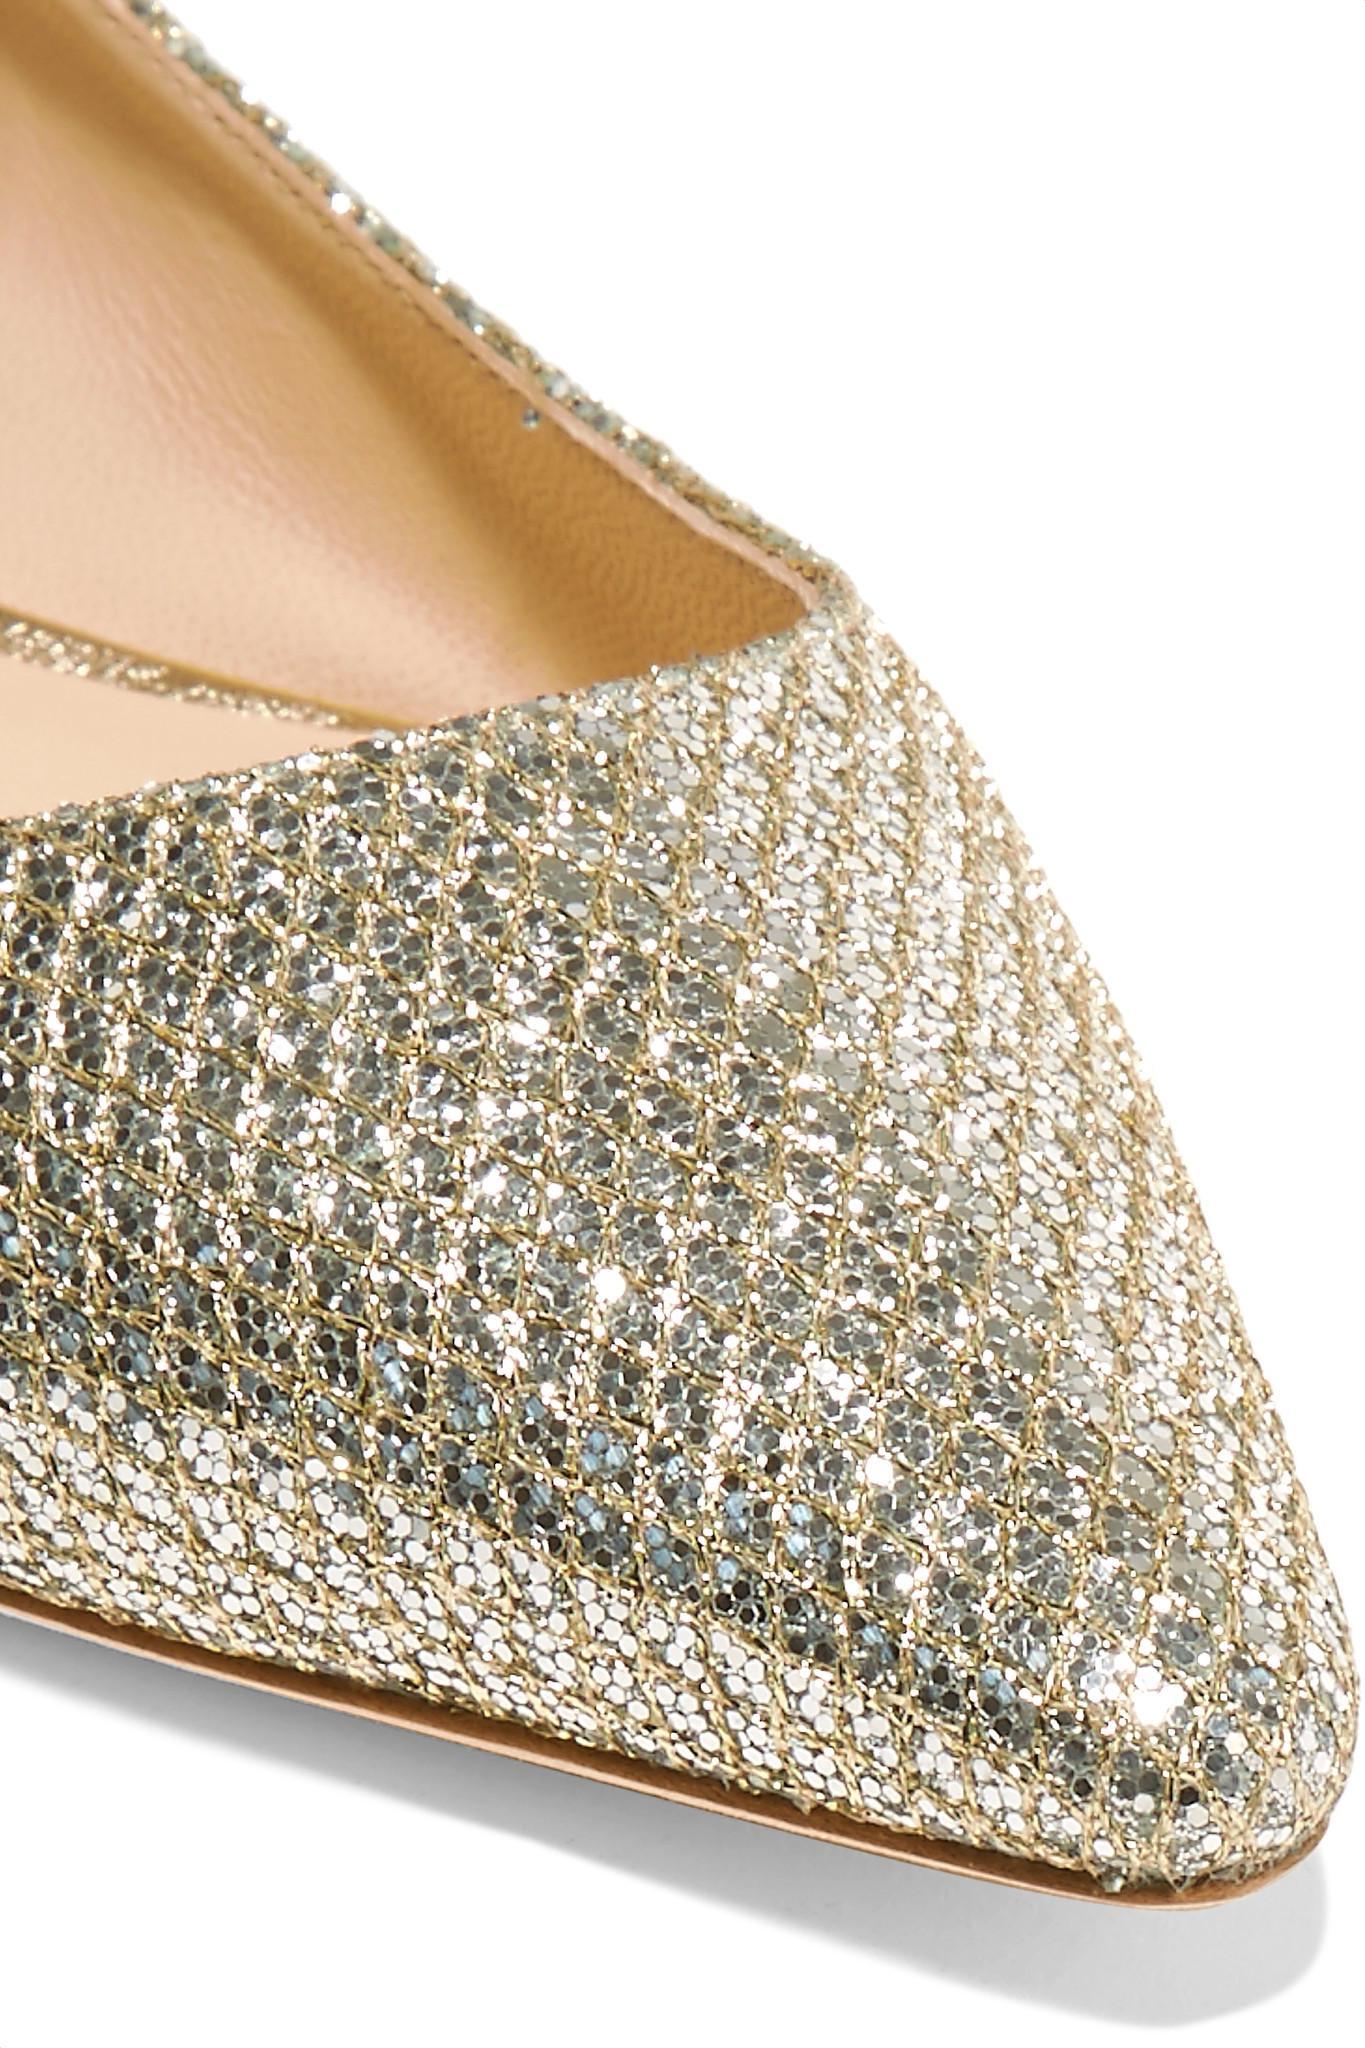 29dc87fe41f5 Jimmy Choo - Metallic Romy Glittered Canvas Point-toe Flats - Lyst. View  fullscreen